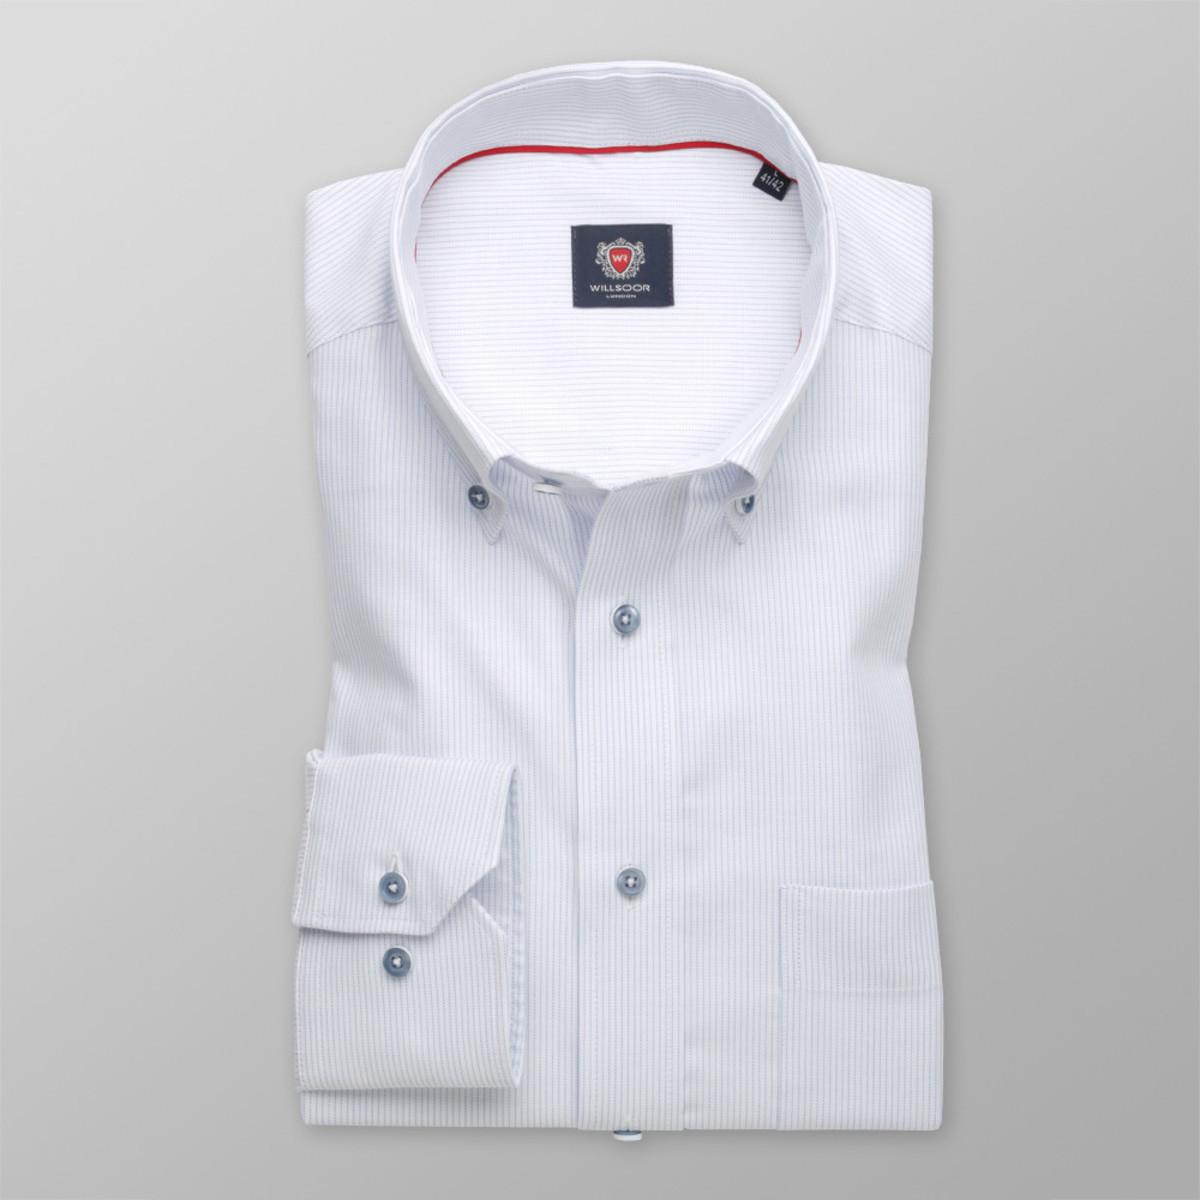 Pánska klasická košeľa London (výška 176-182) 8791 176-182 / XL (43/44)